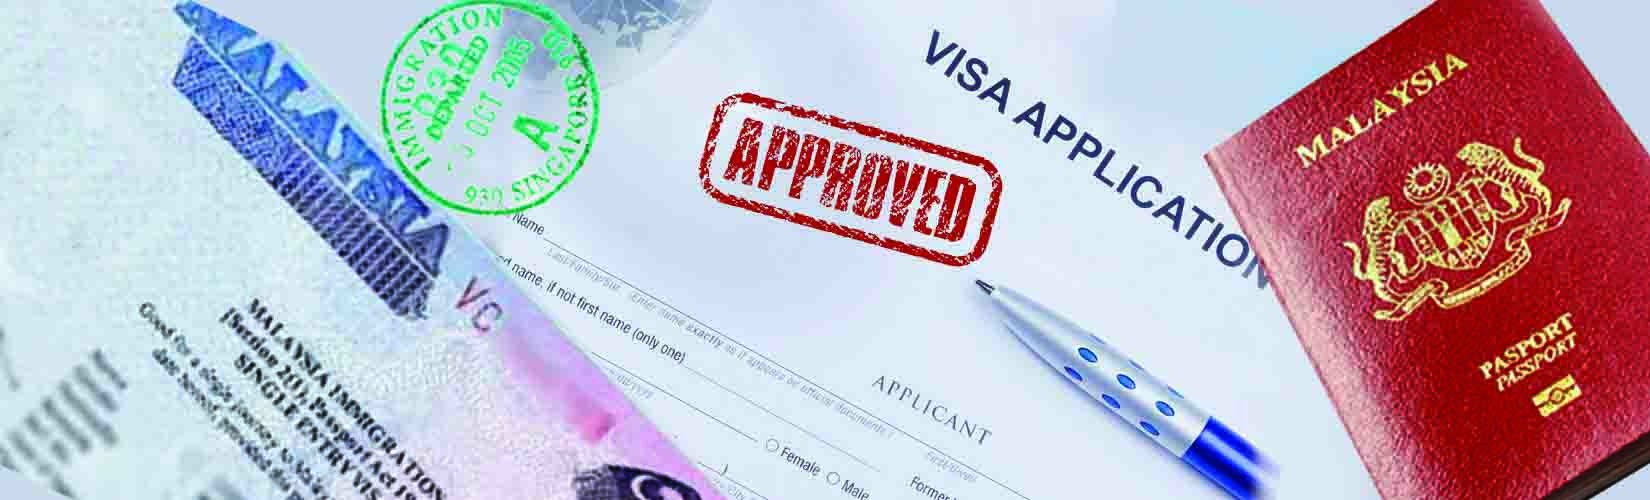 Malaysia Travel Info: Complete Malaysia Tourist Visa Information